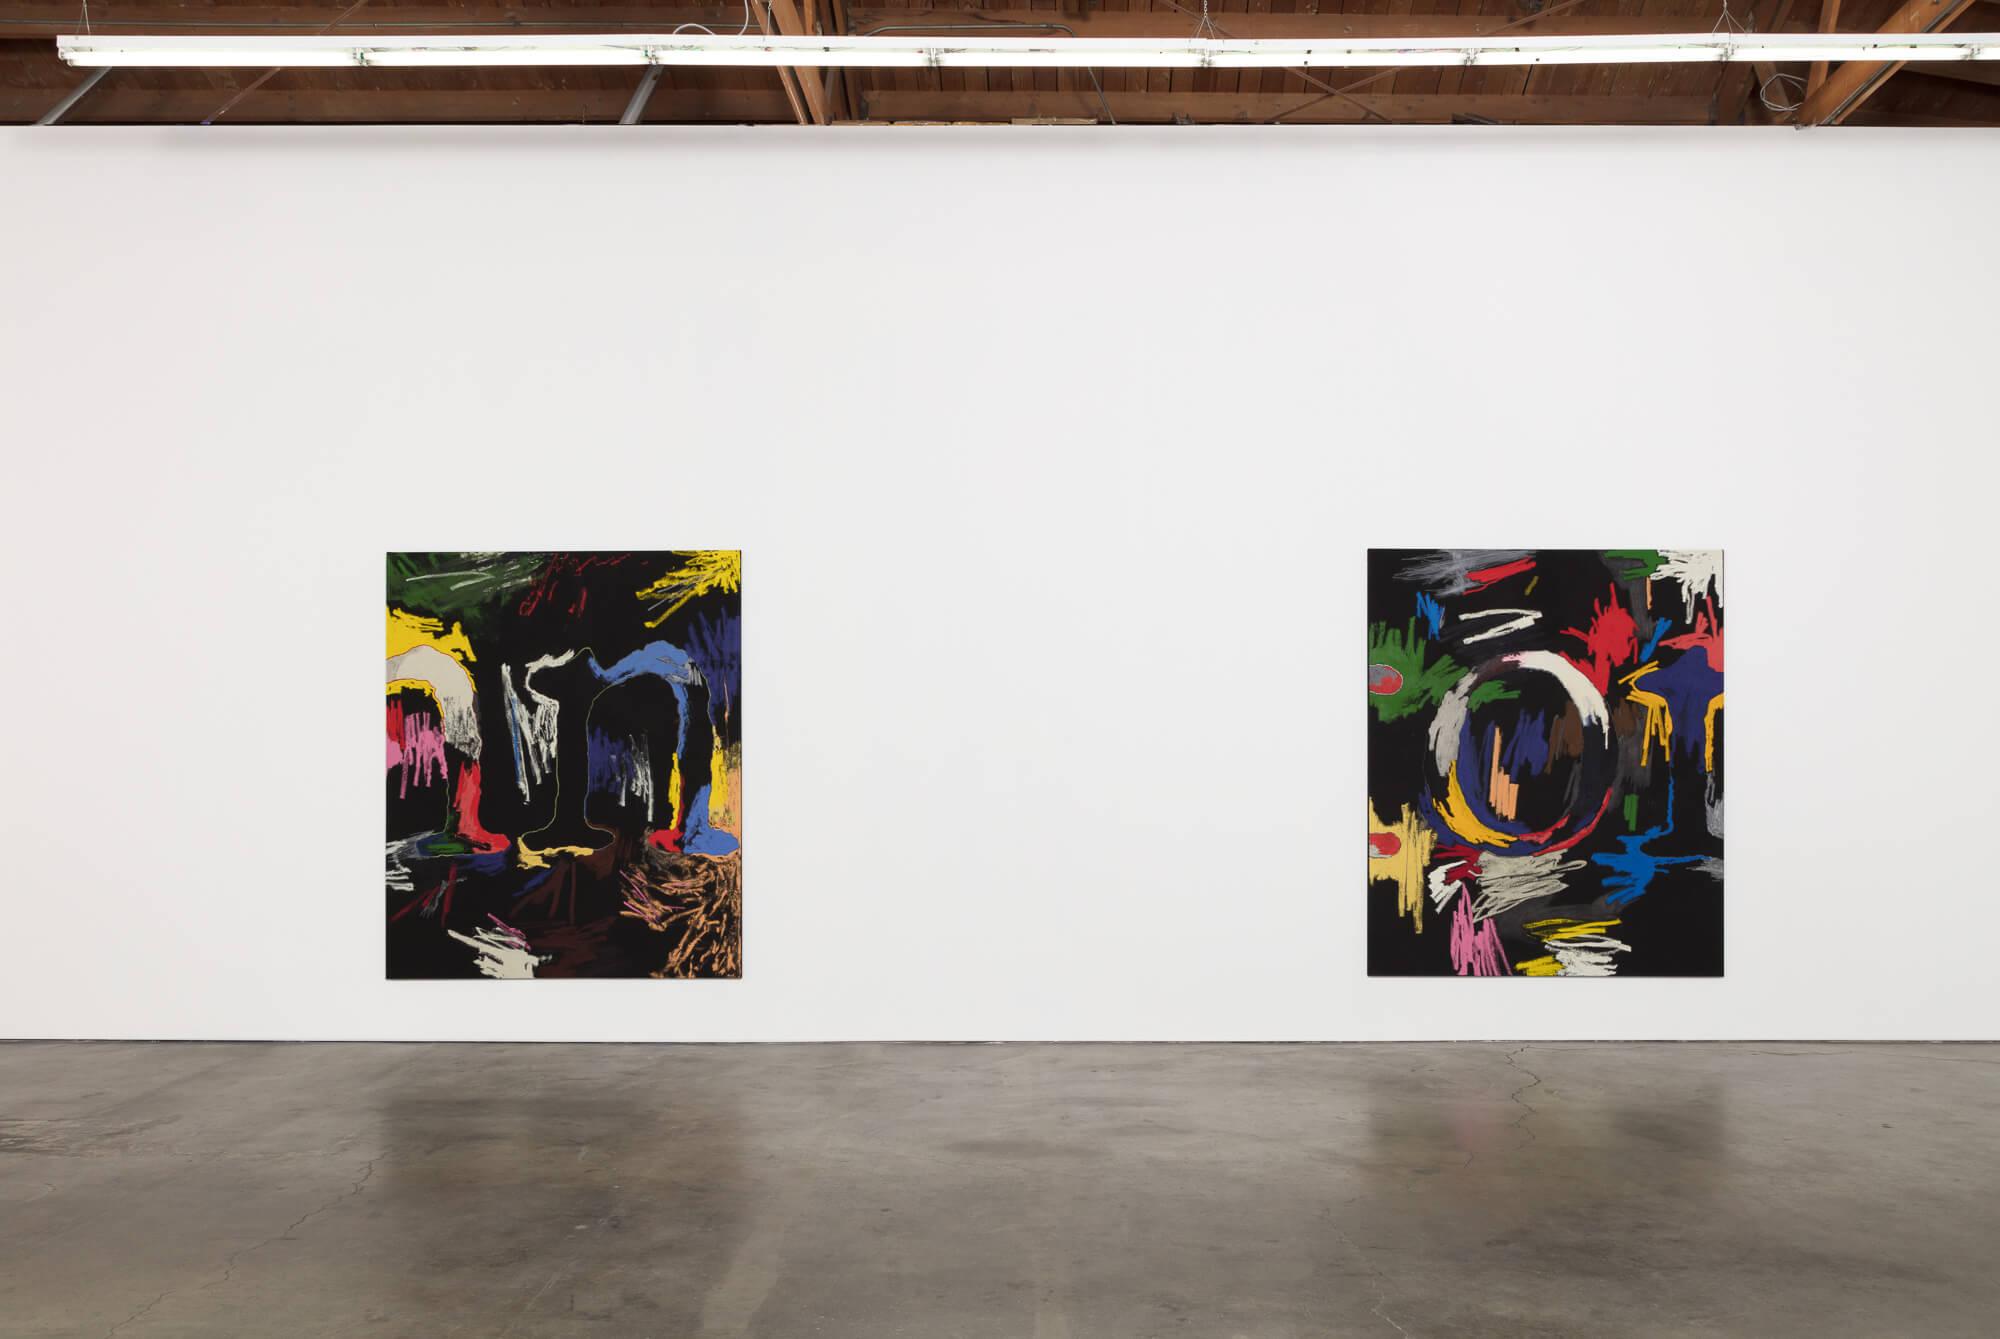 1_William Anastasi, installlation view, Ghebaly Gallery